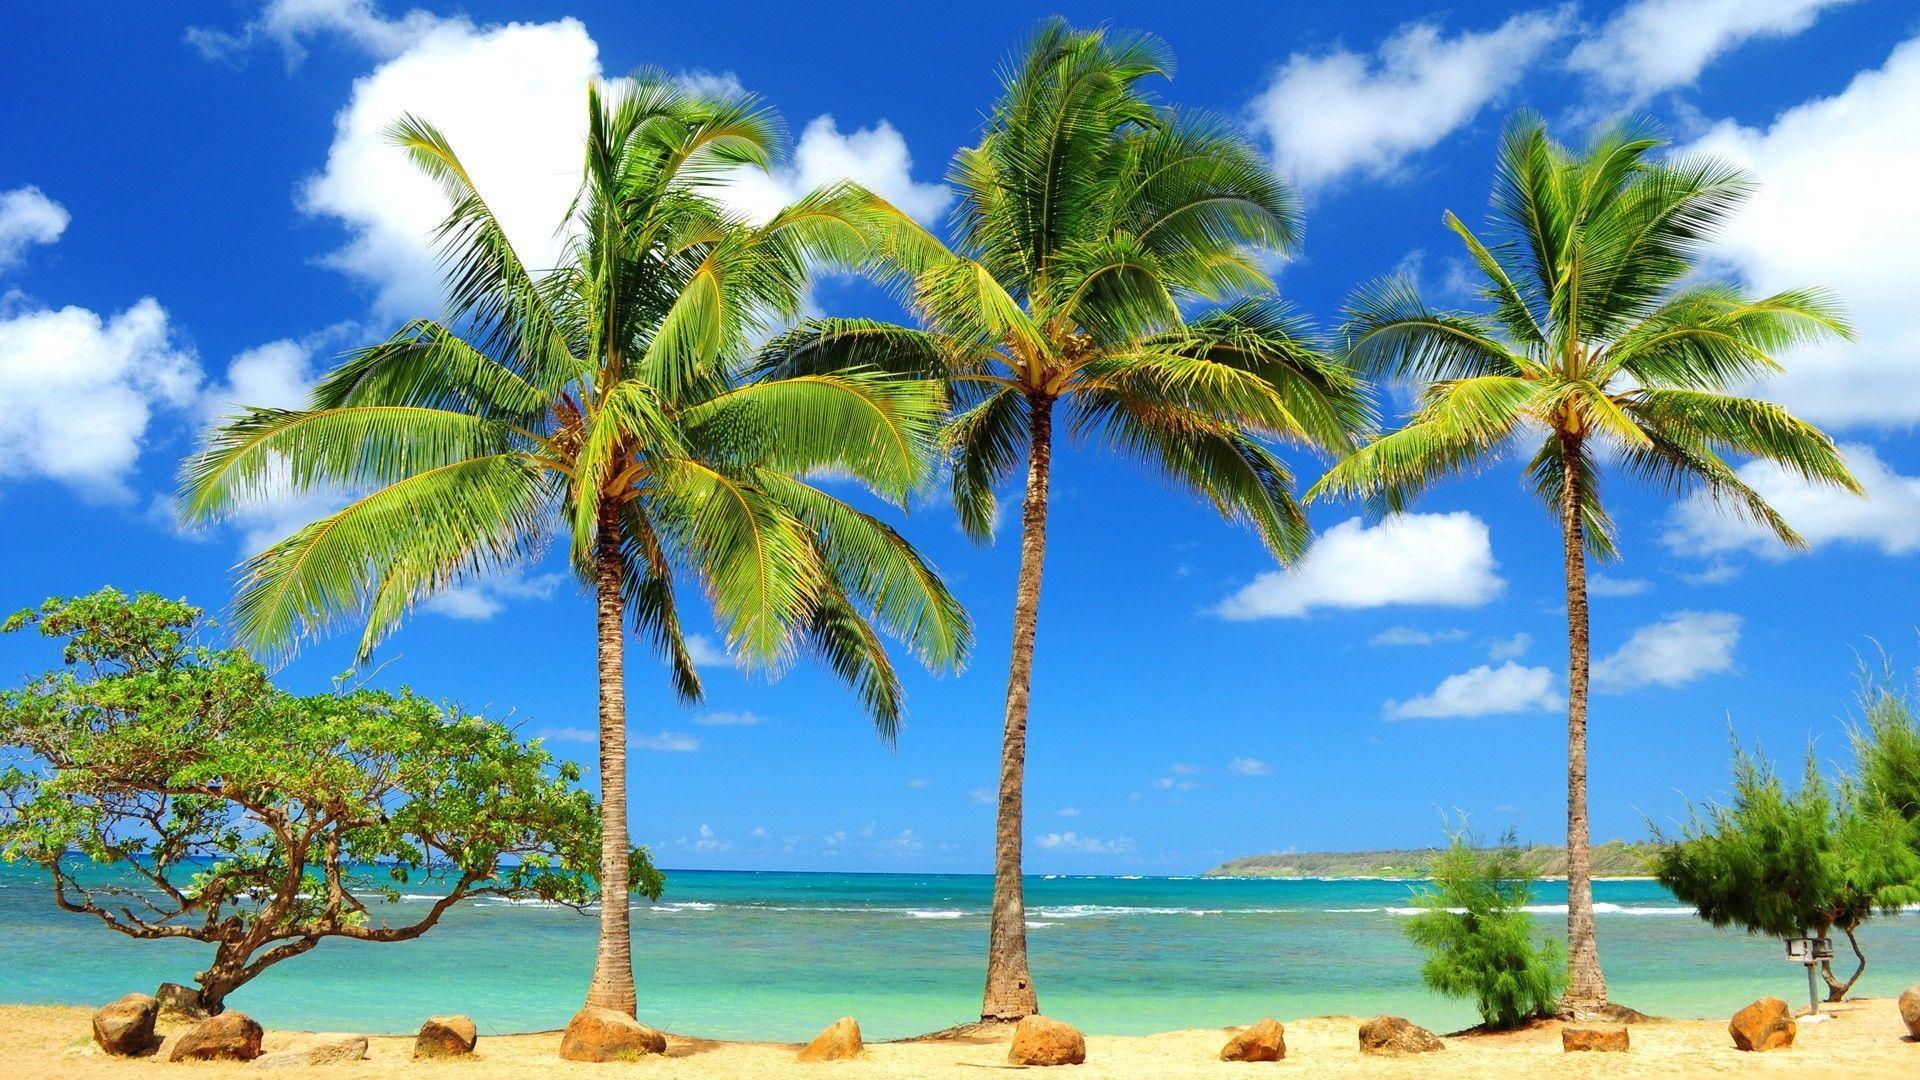 Wailua Maui Hawaii HD Desktop Wallpaper for K Ultra HD TV